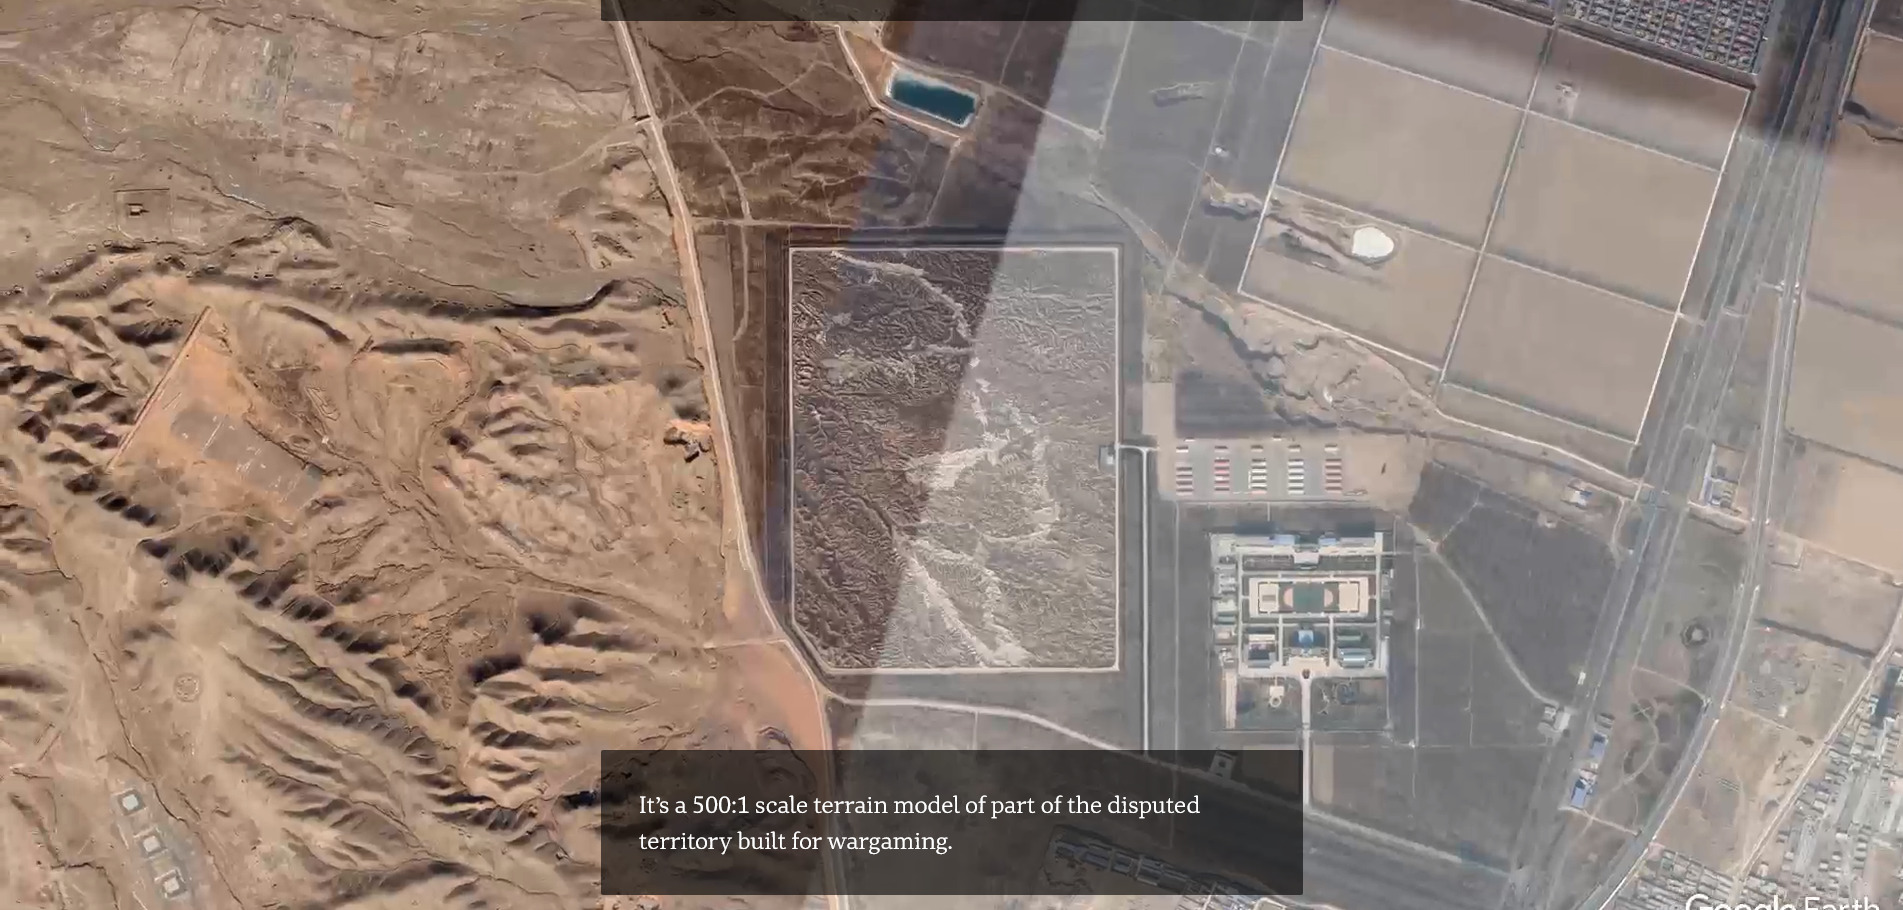 High stakes in a Himalayan hotspot-screenshot_2020-07-10-china-built-massive